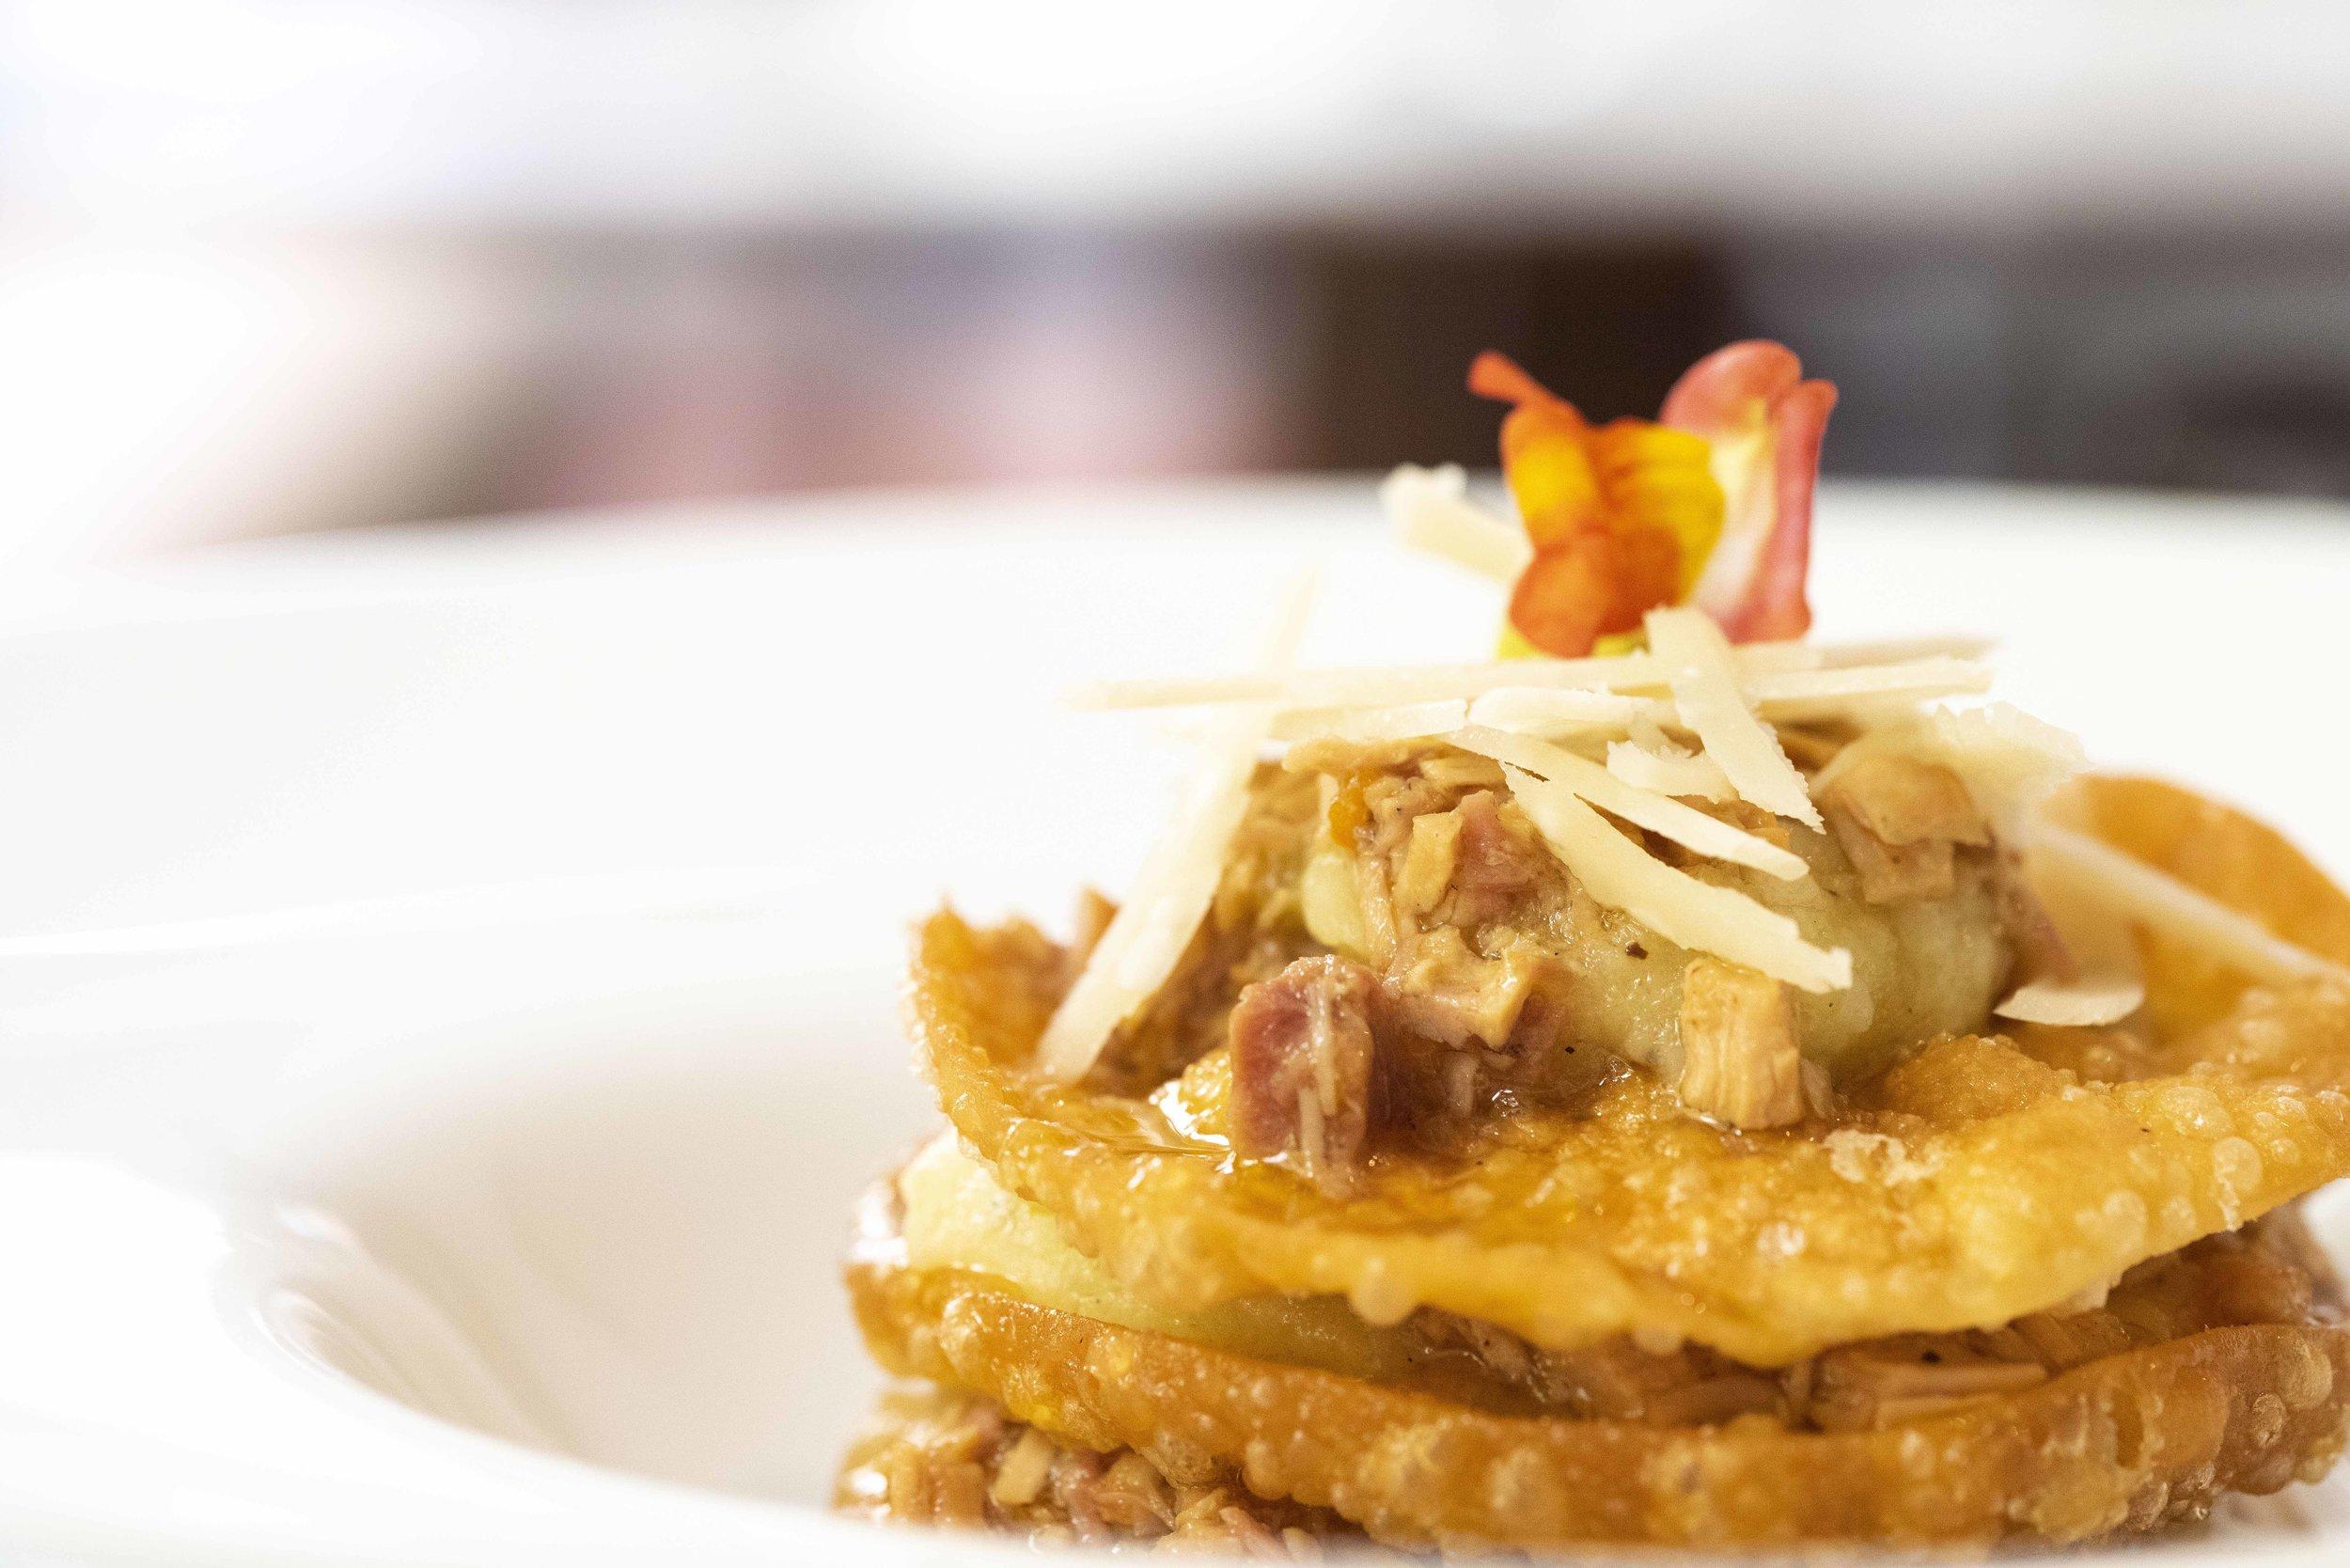 Rice lasagna with guineafowl ragu at Fastuc Restaurant, Barcelona. Photo © Barcelona Food Experience.